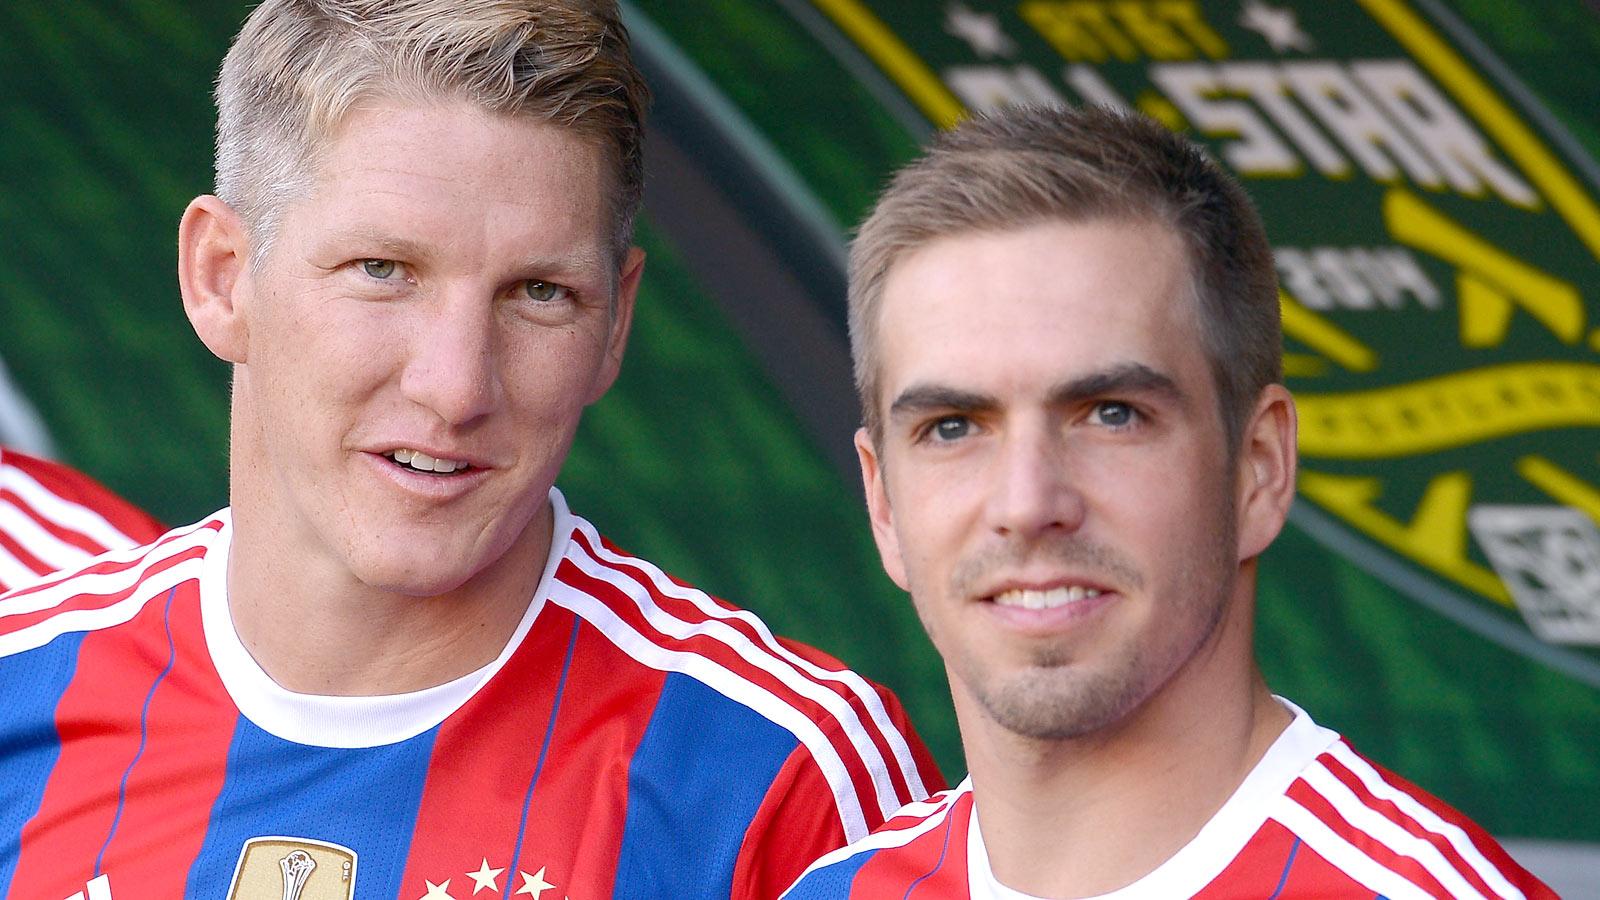 Bayern captain Lahm upset at prospect of losing Schweinsteiger